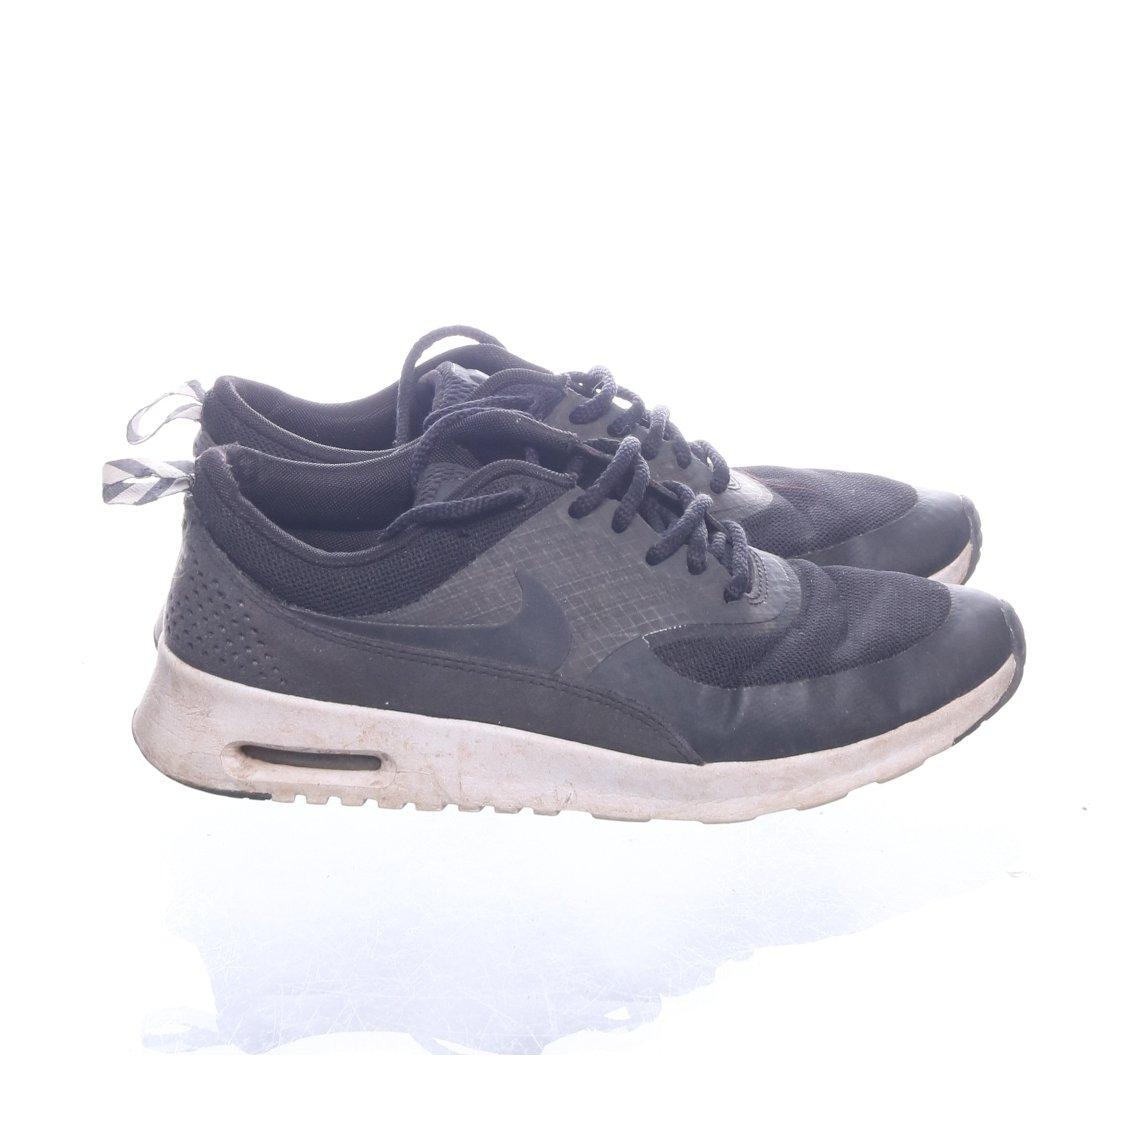 best website 9283c 2c923 Nike, Sneakers, Strl  38,5, Air Max Thea, Svart